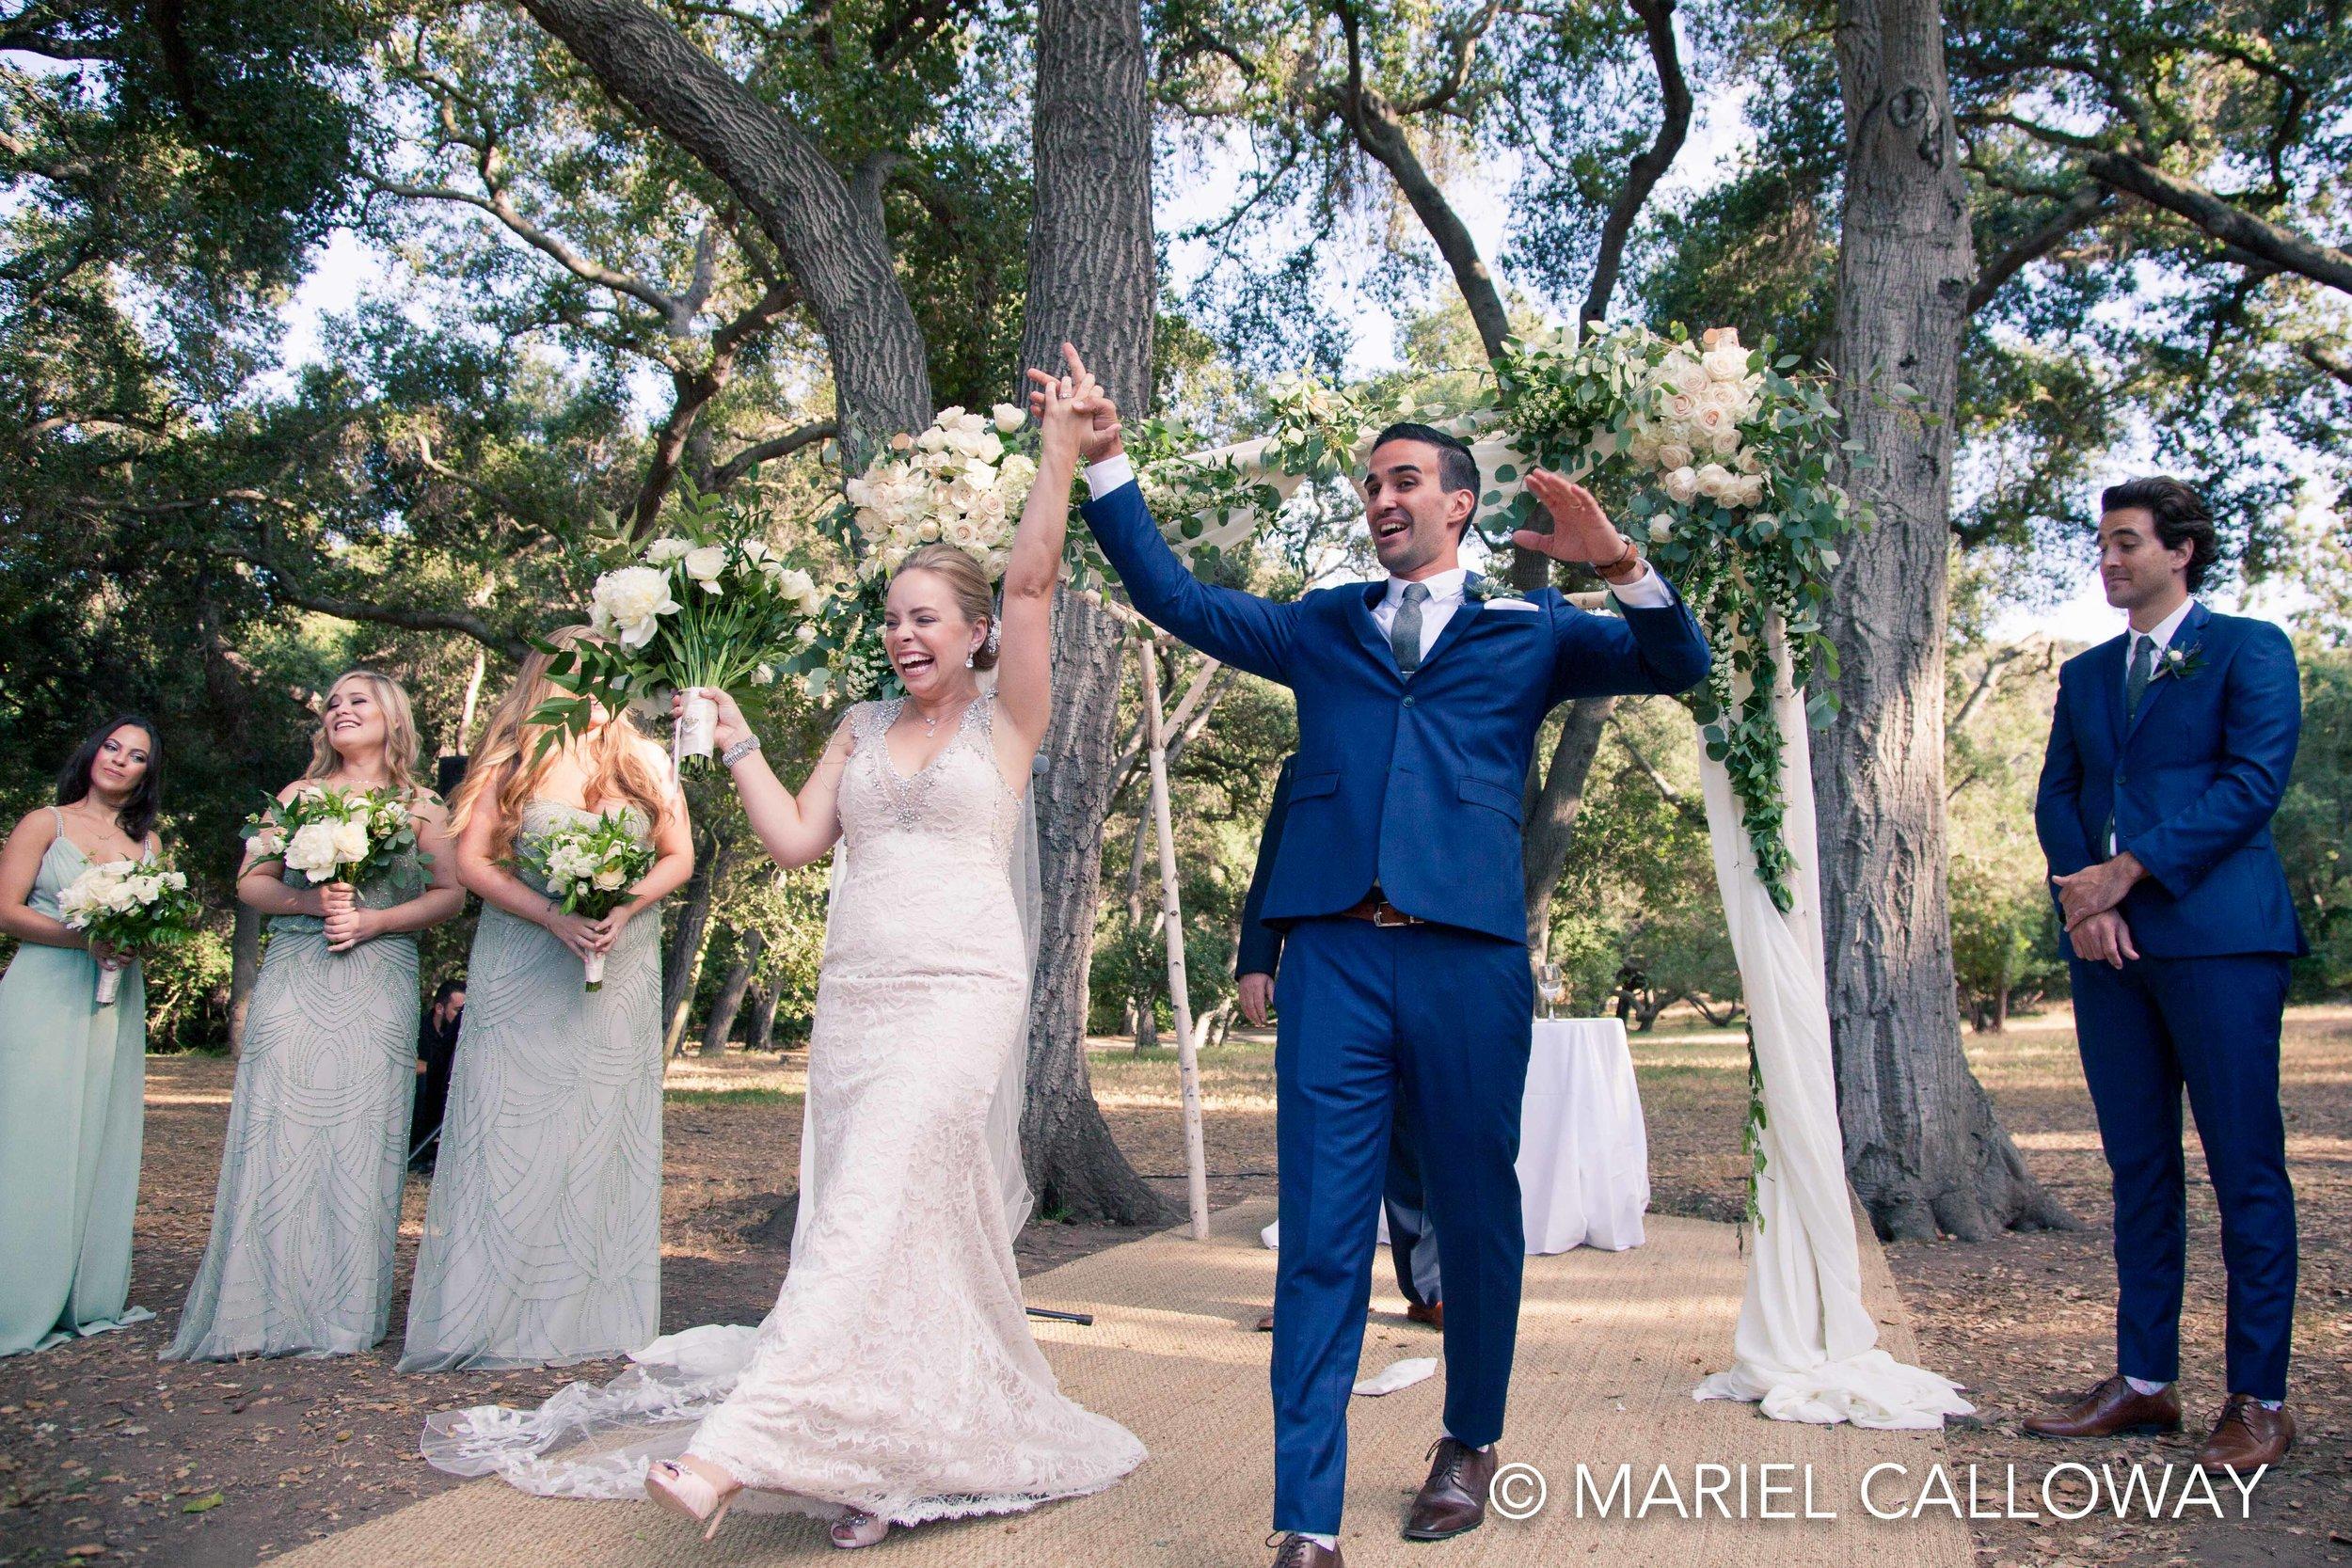 Mariel-Calloway-Los-Angeles-Wedding-Photography-Smith-25.jpg